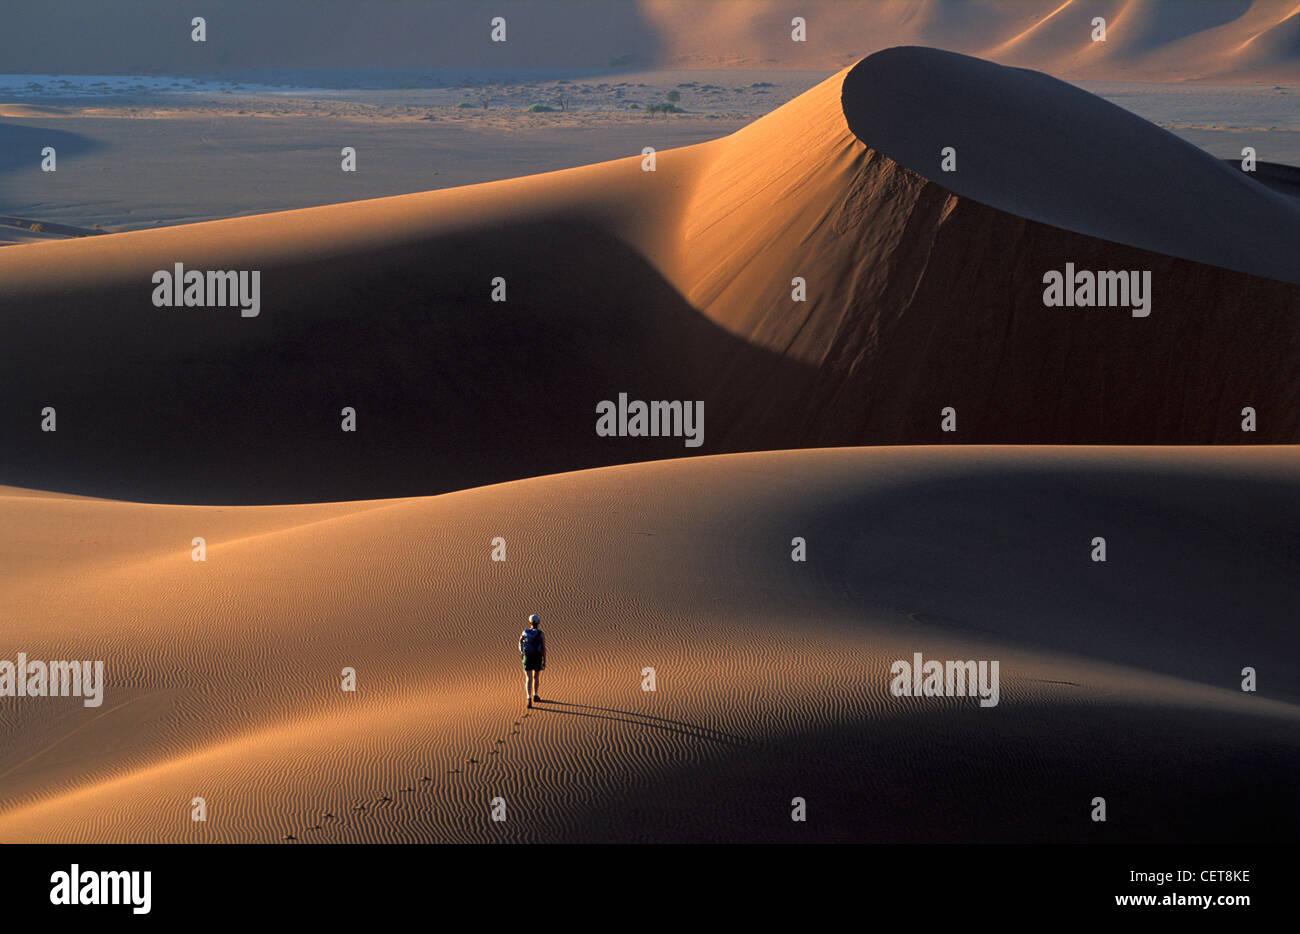 Audazmente de rodadura sobre dunas de arena, el desierto de Namib, Namibia, Africa Imagen De Stock